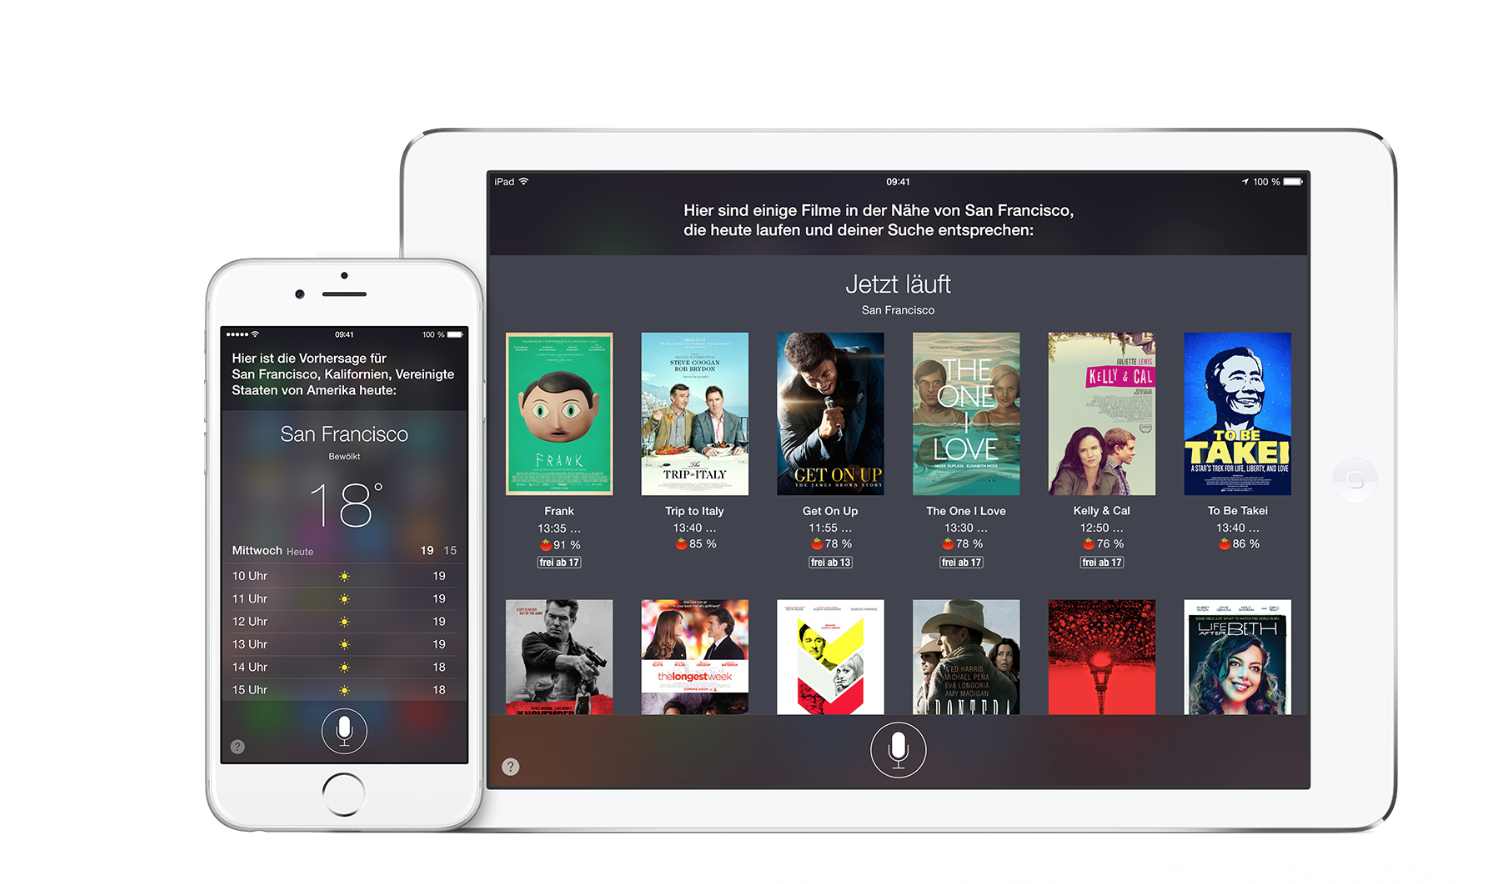 Apple's Siri als Assistent auf dem iPhone oder iPad